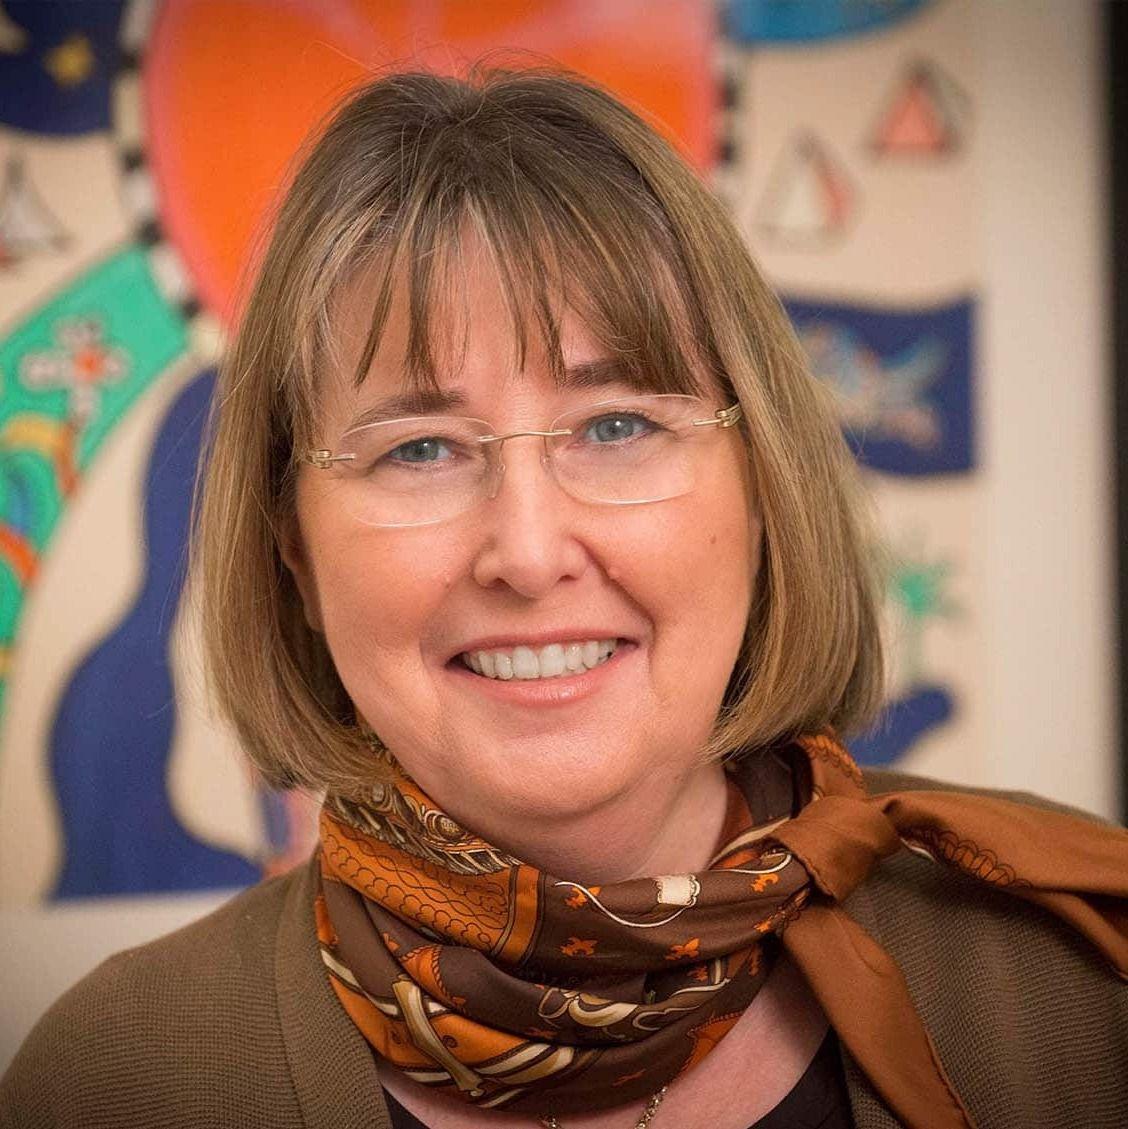 Nathalie Auber